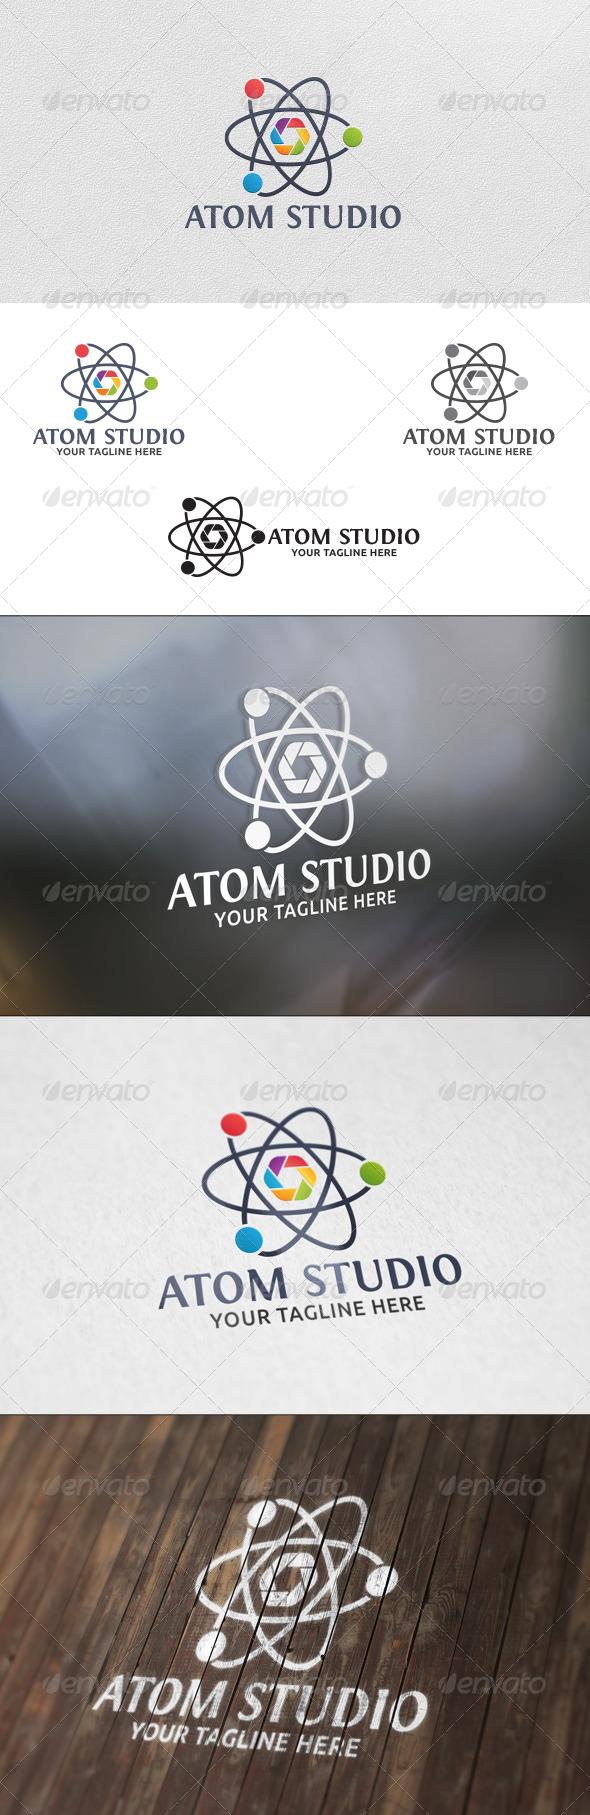 Atom Studio - Logo Template - Symbols Logo Templates